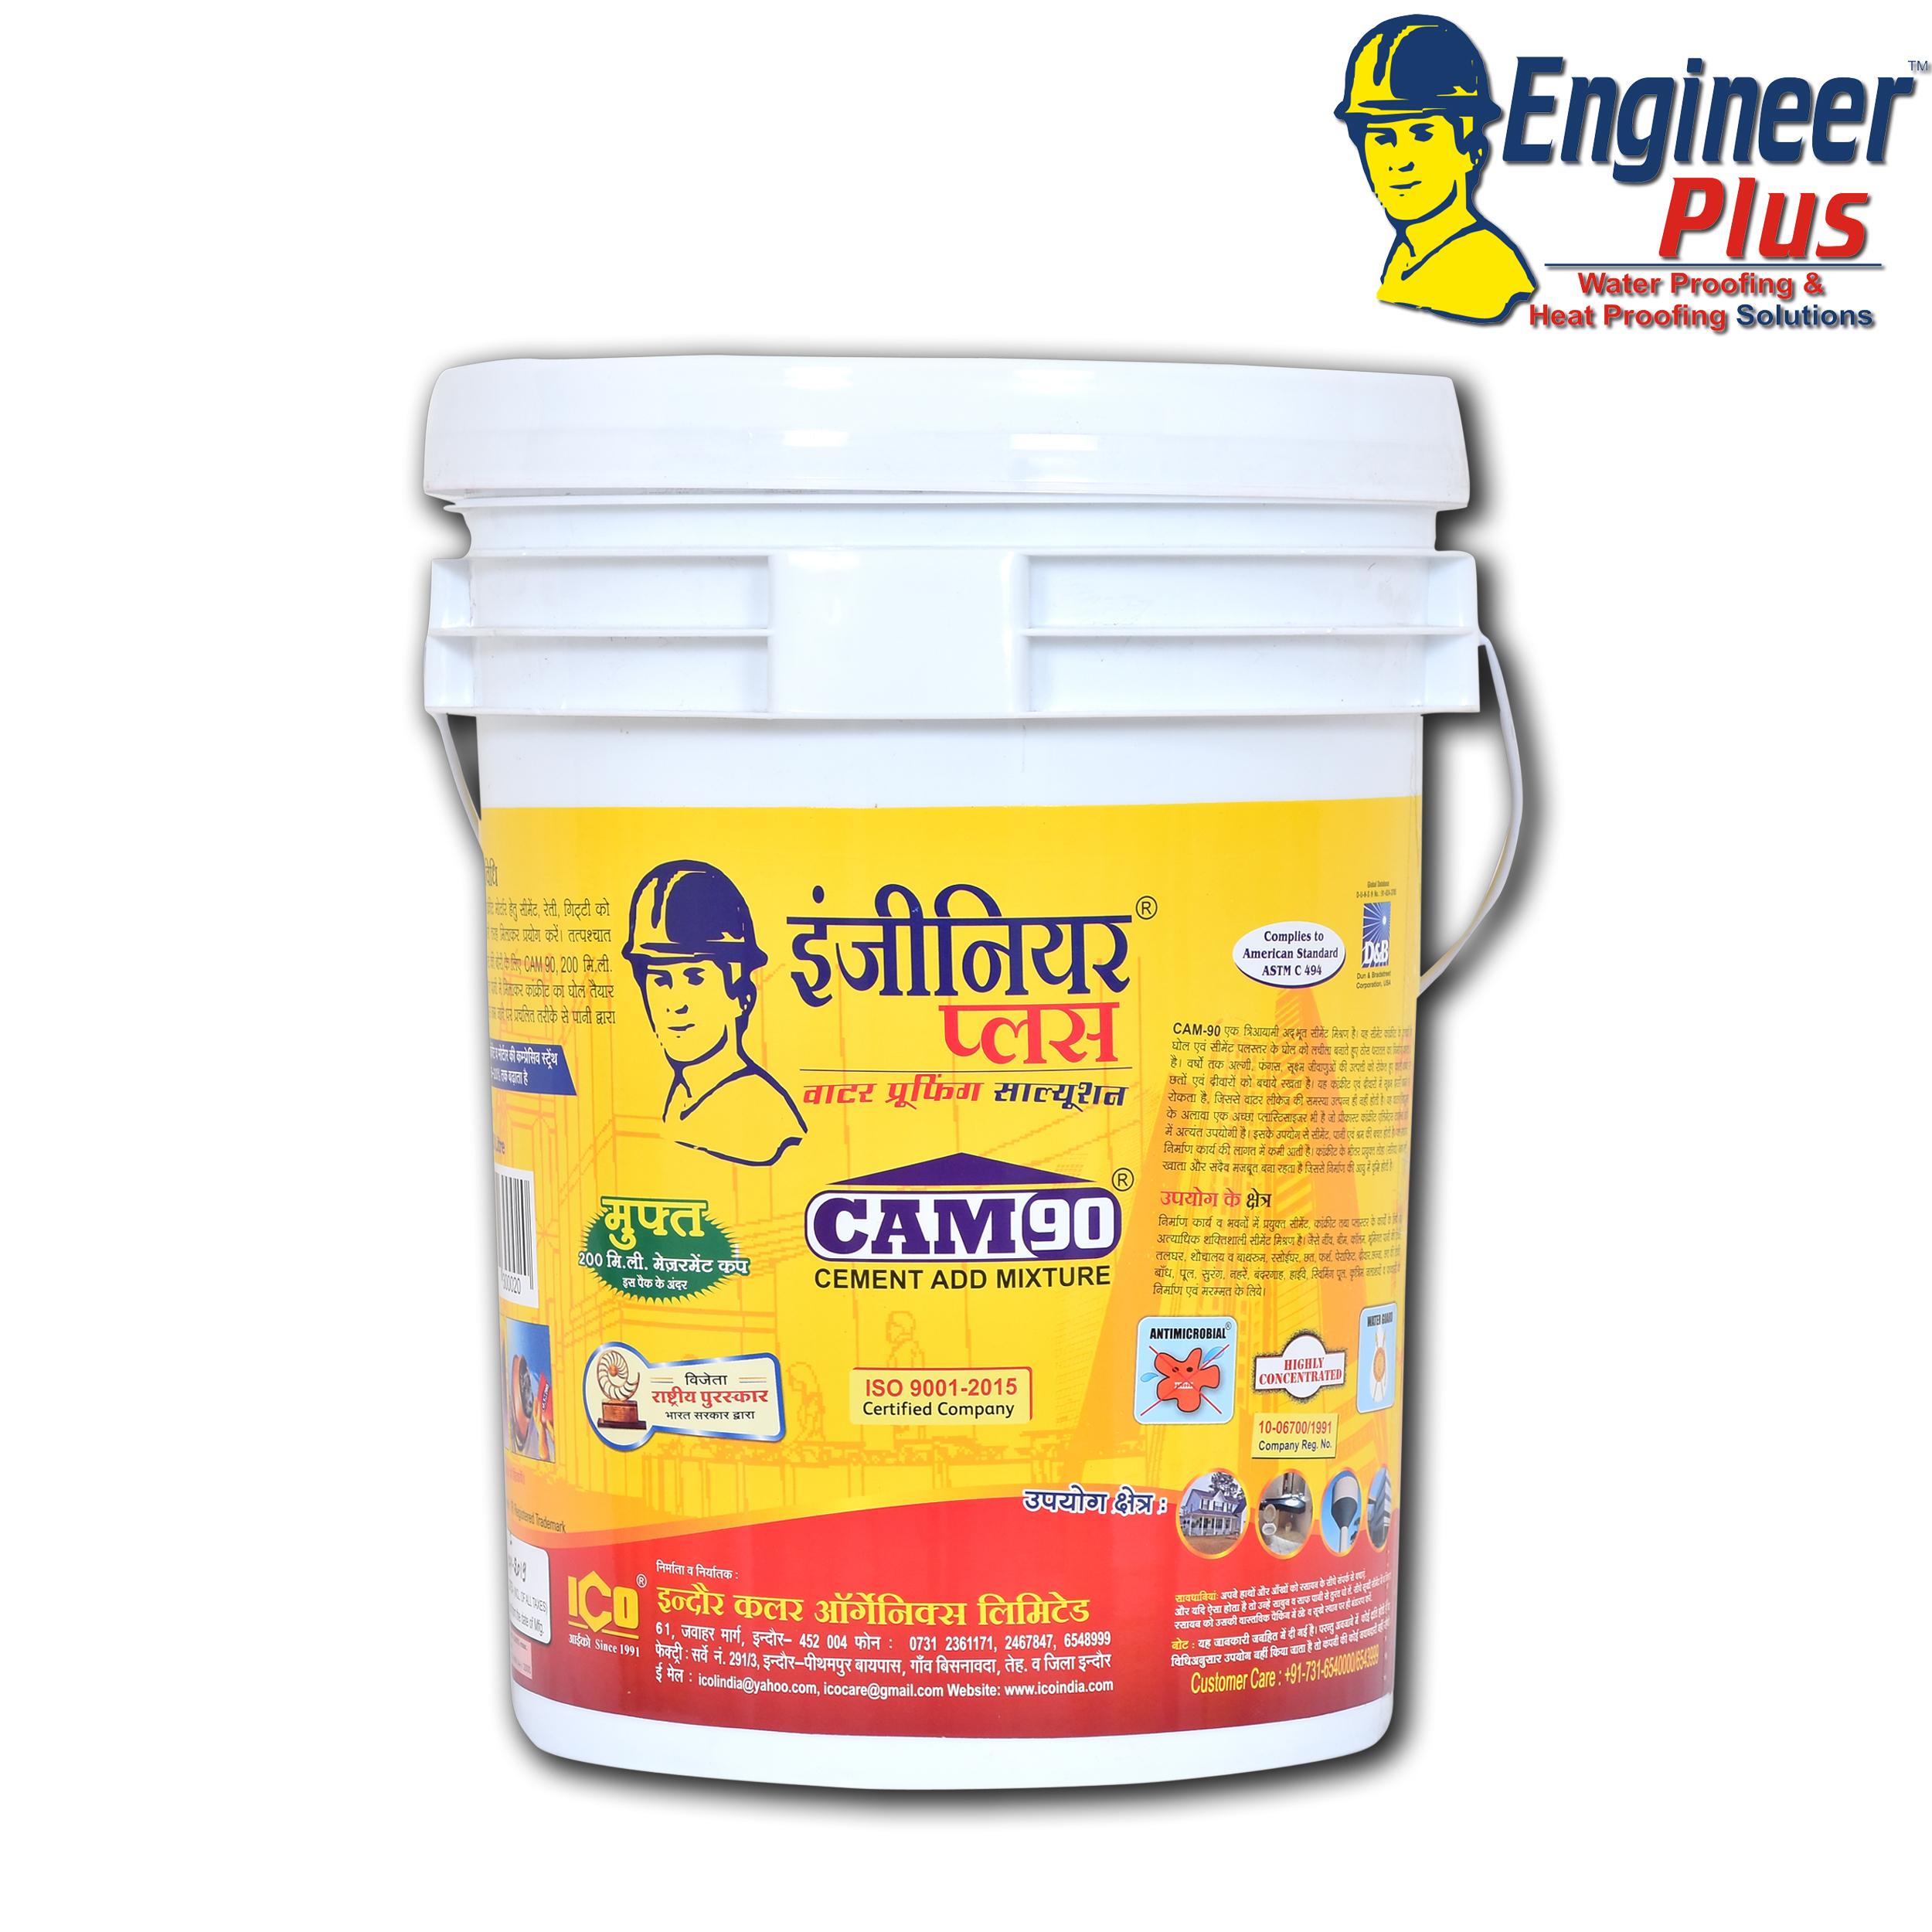 CAM 90 Waterproofing Chemical